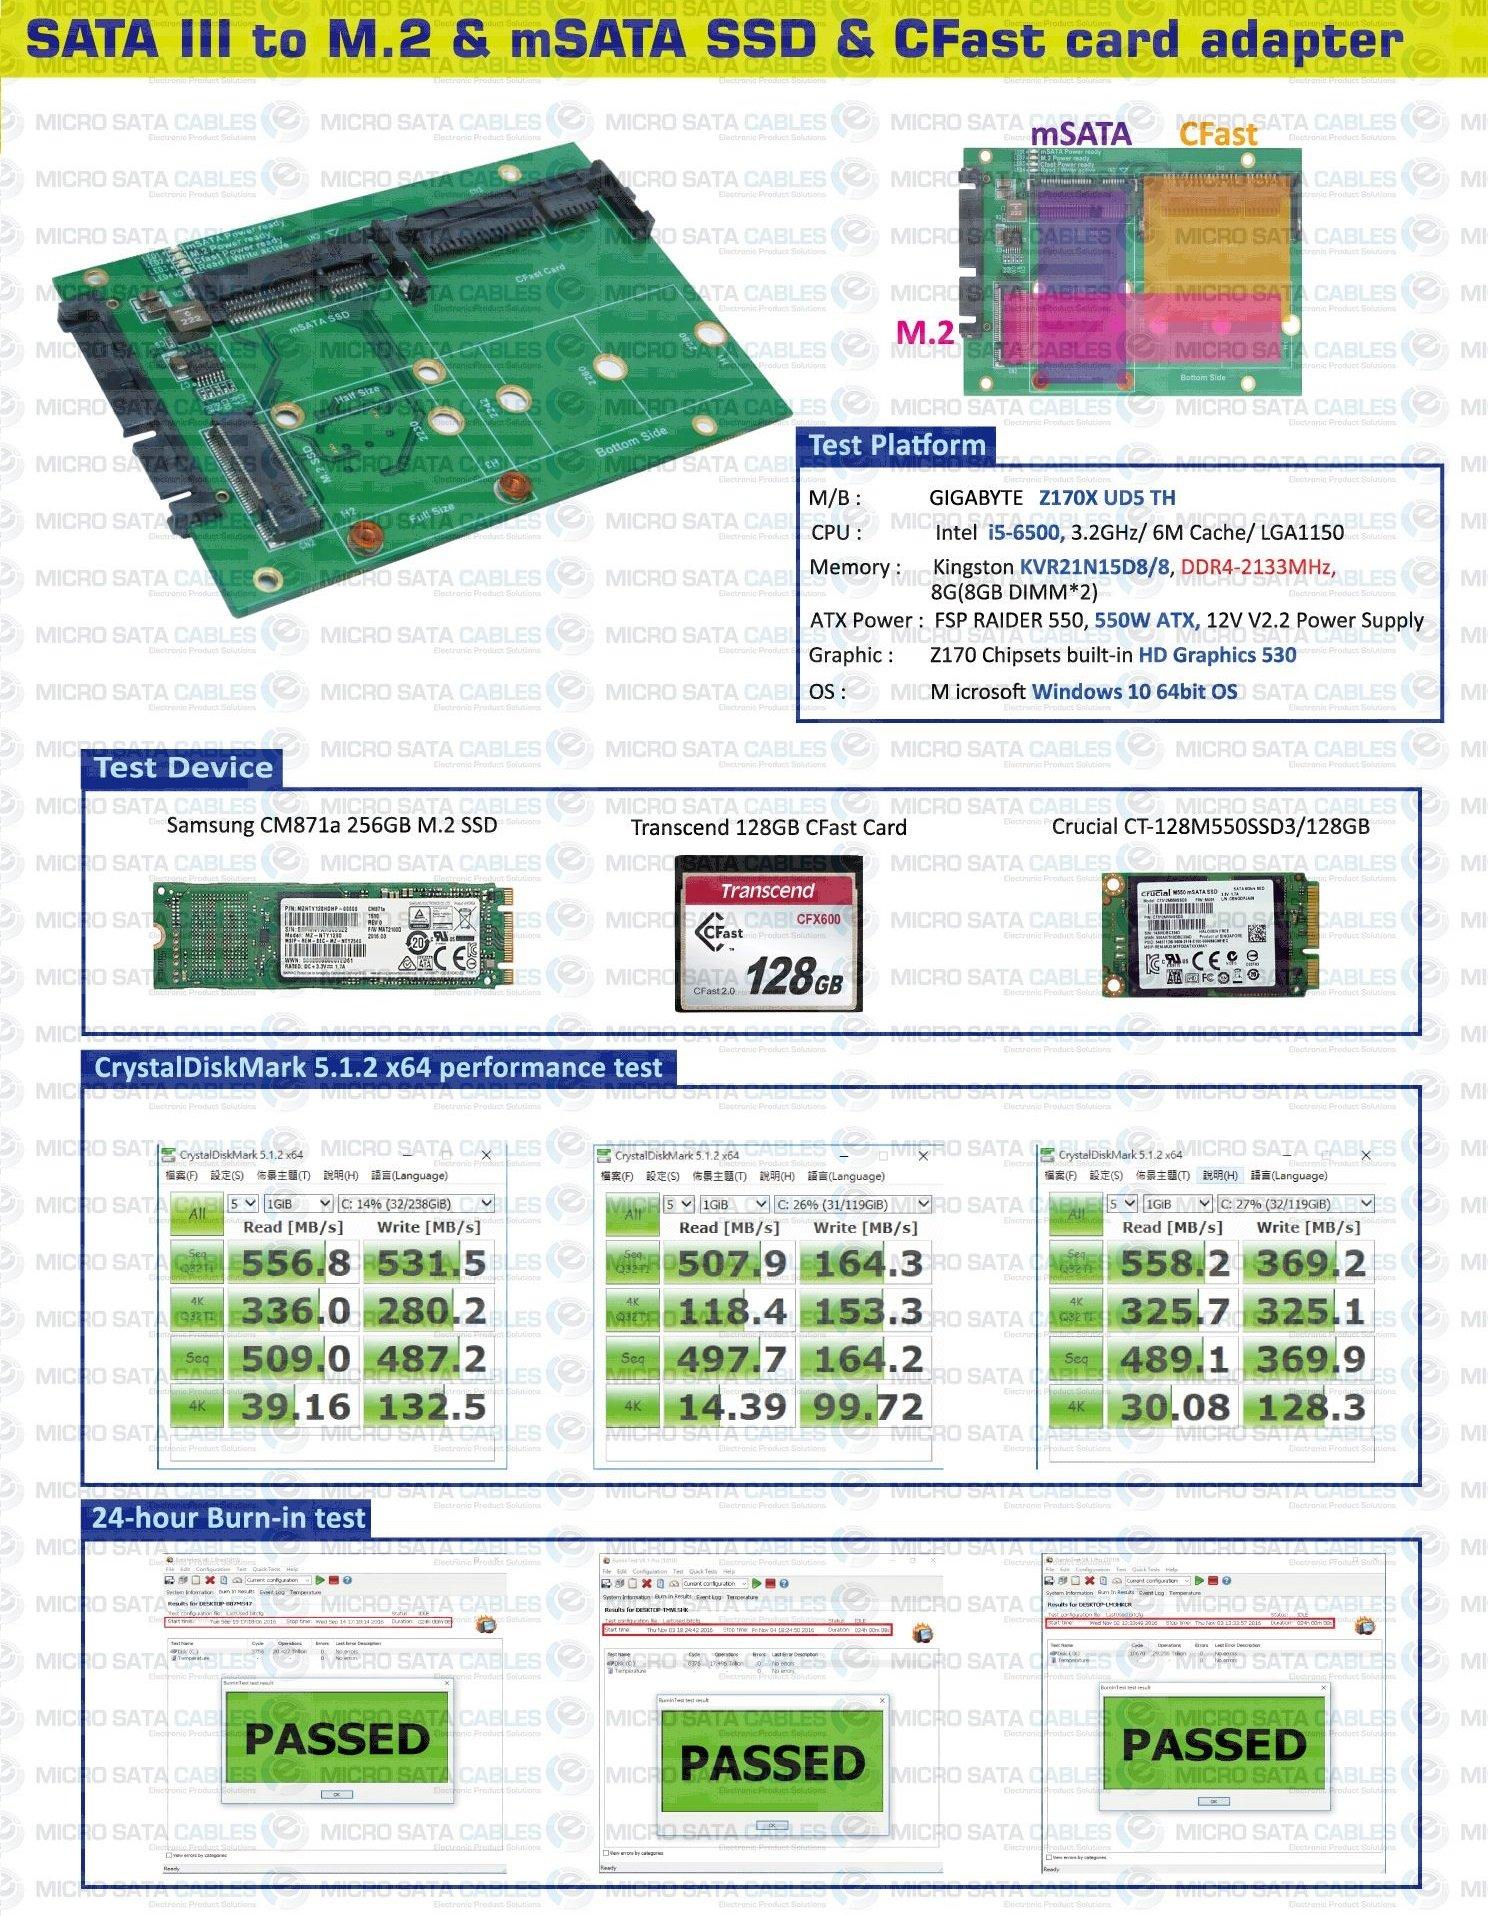 SATA III to mSATA & M.2 SSD & CFast Card Adapter